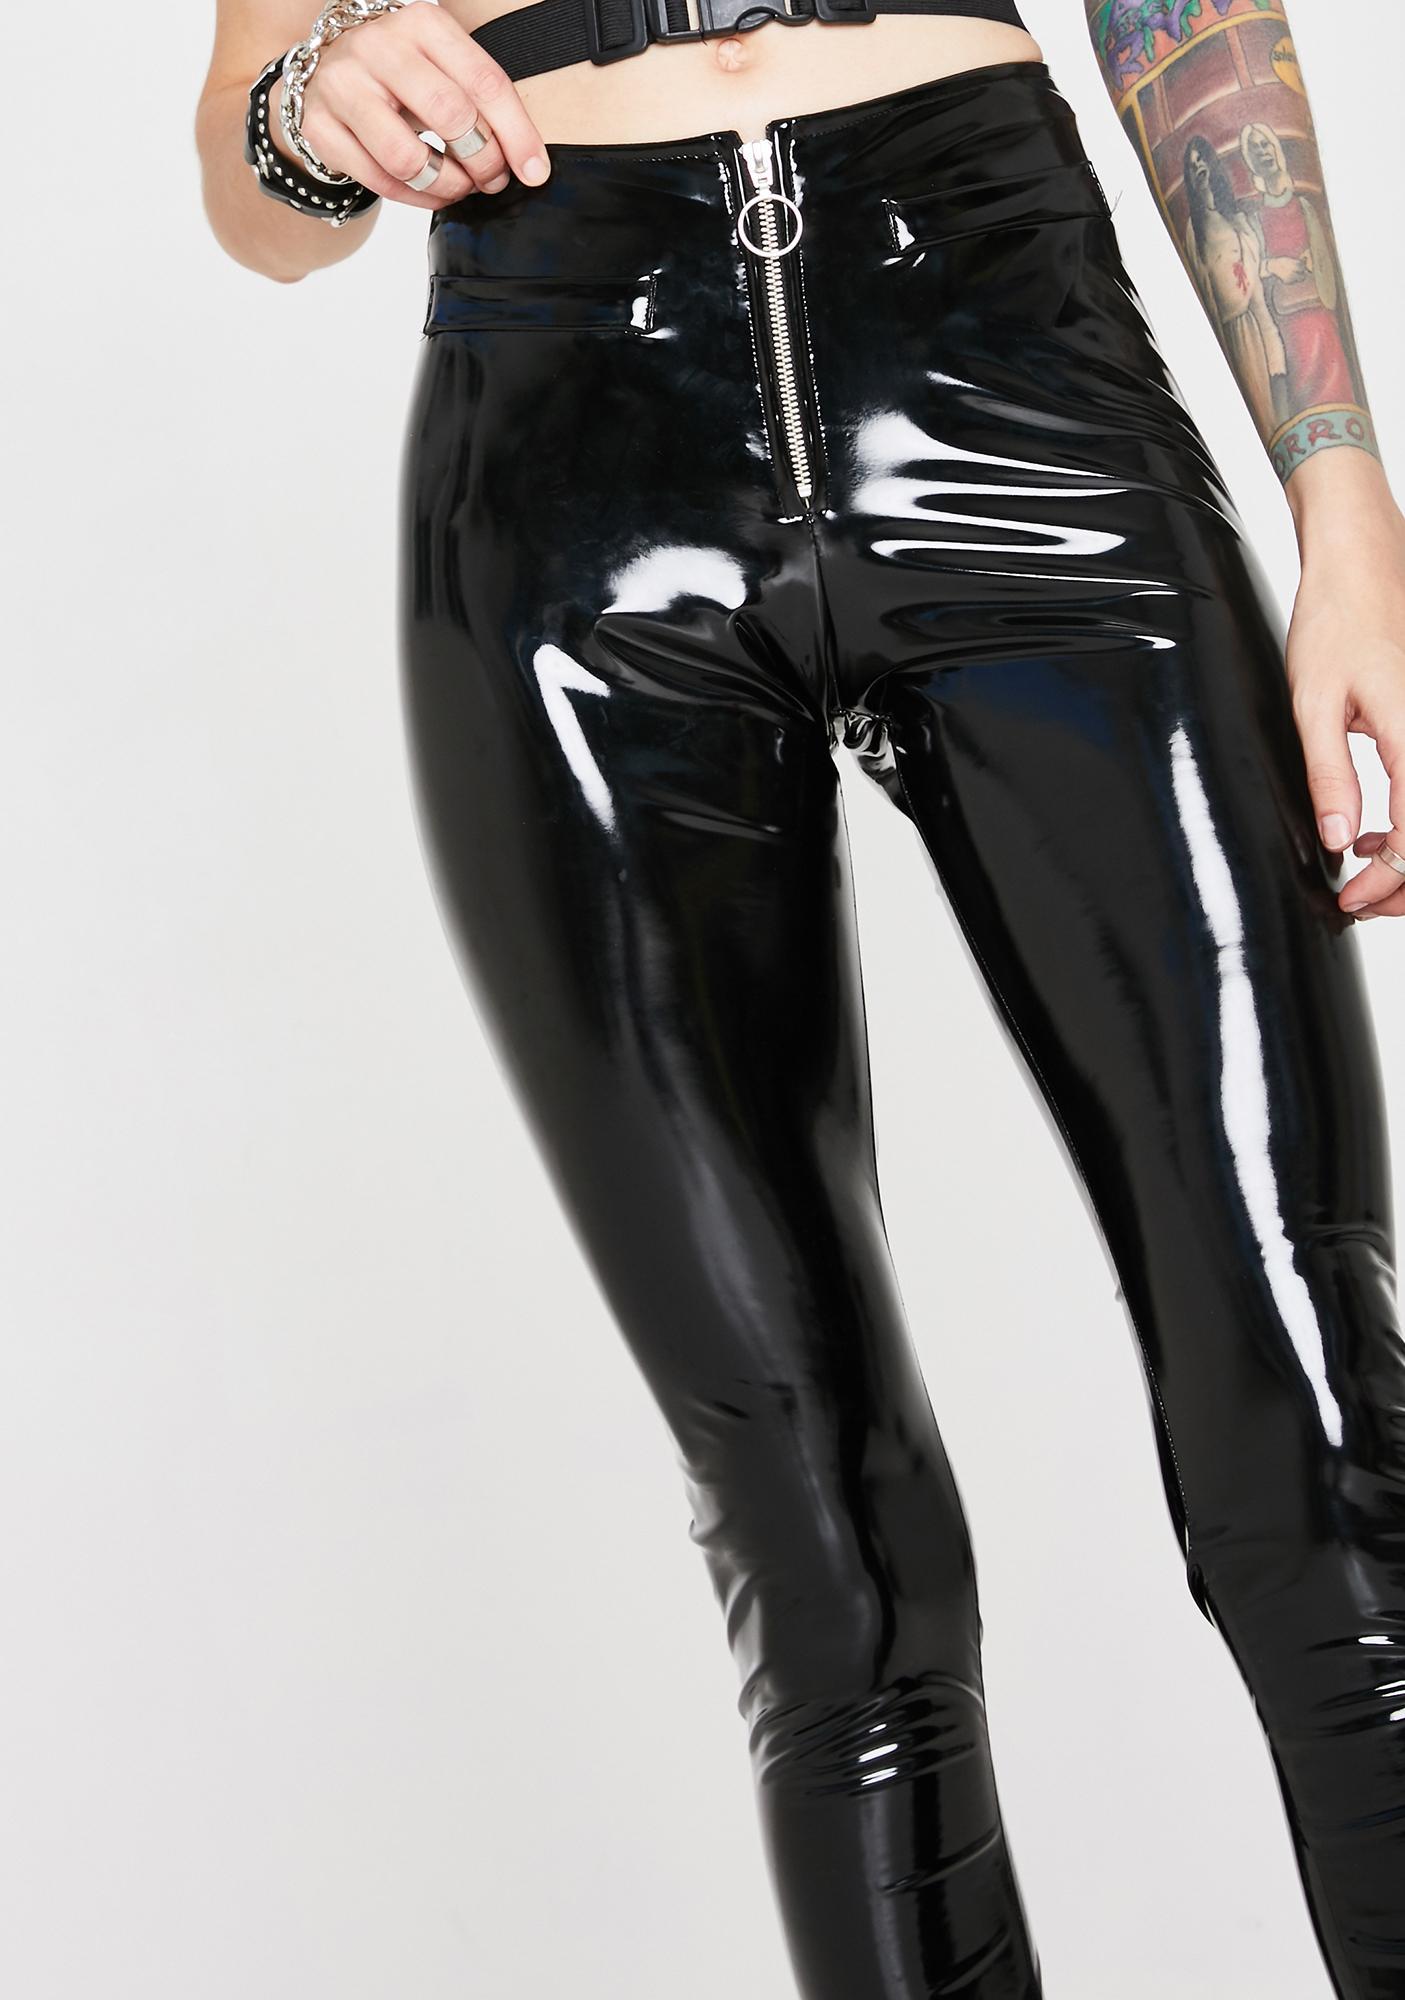 Forbidden Clothing Lose Control Zip Pants